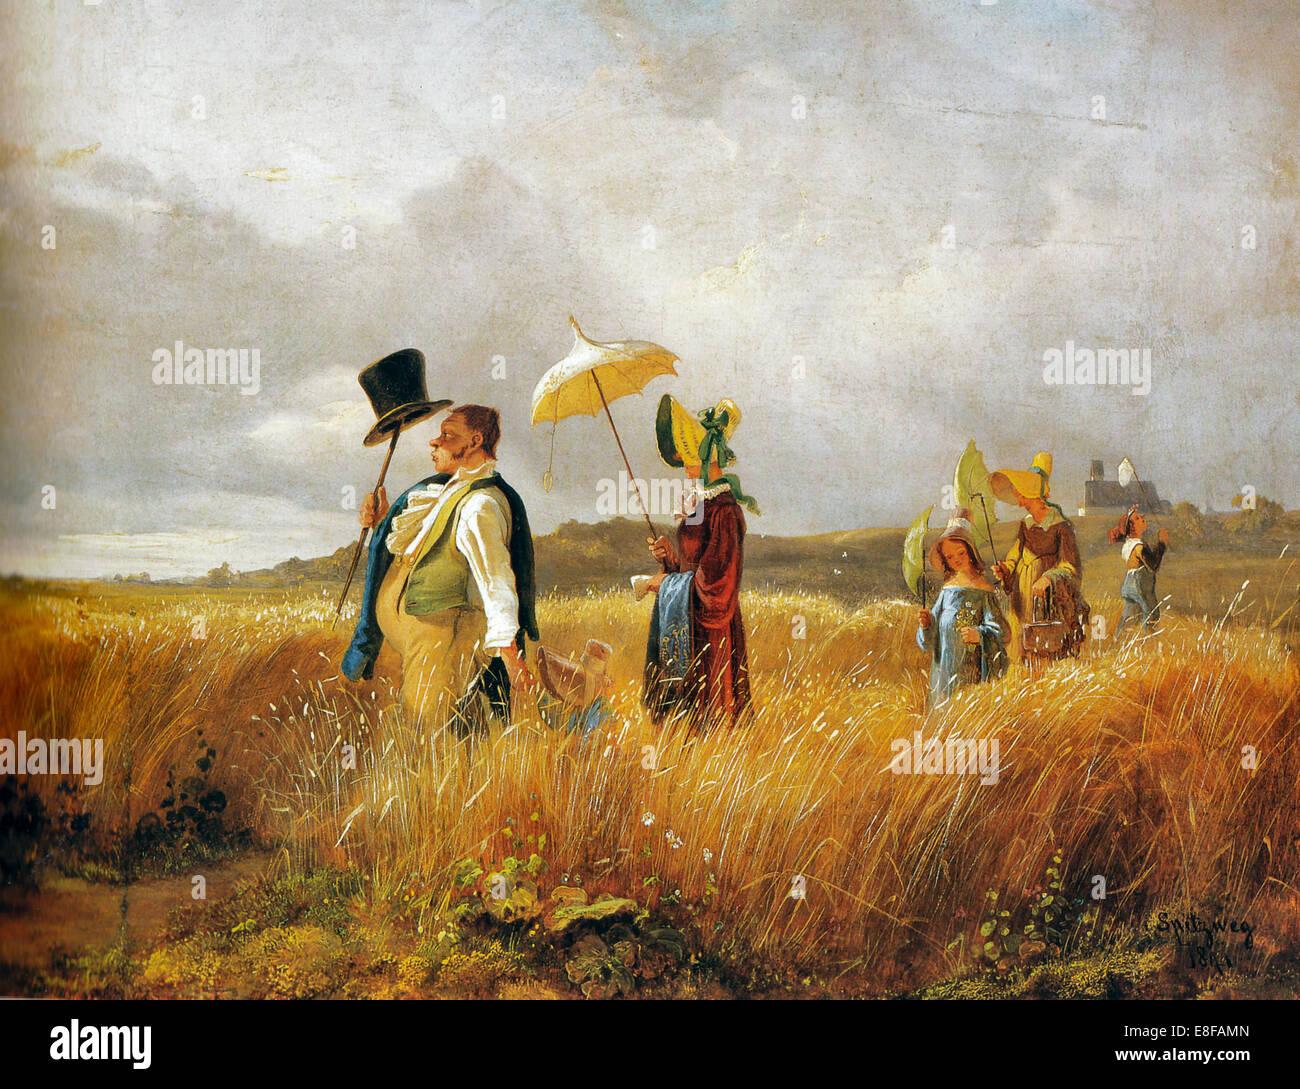 Sunday Stroll. Artist: Spitzweg, Carl (1808-1885) - Stock Image